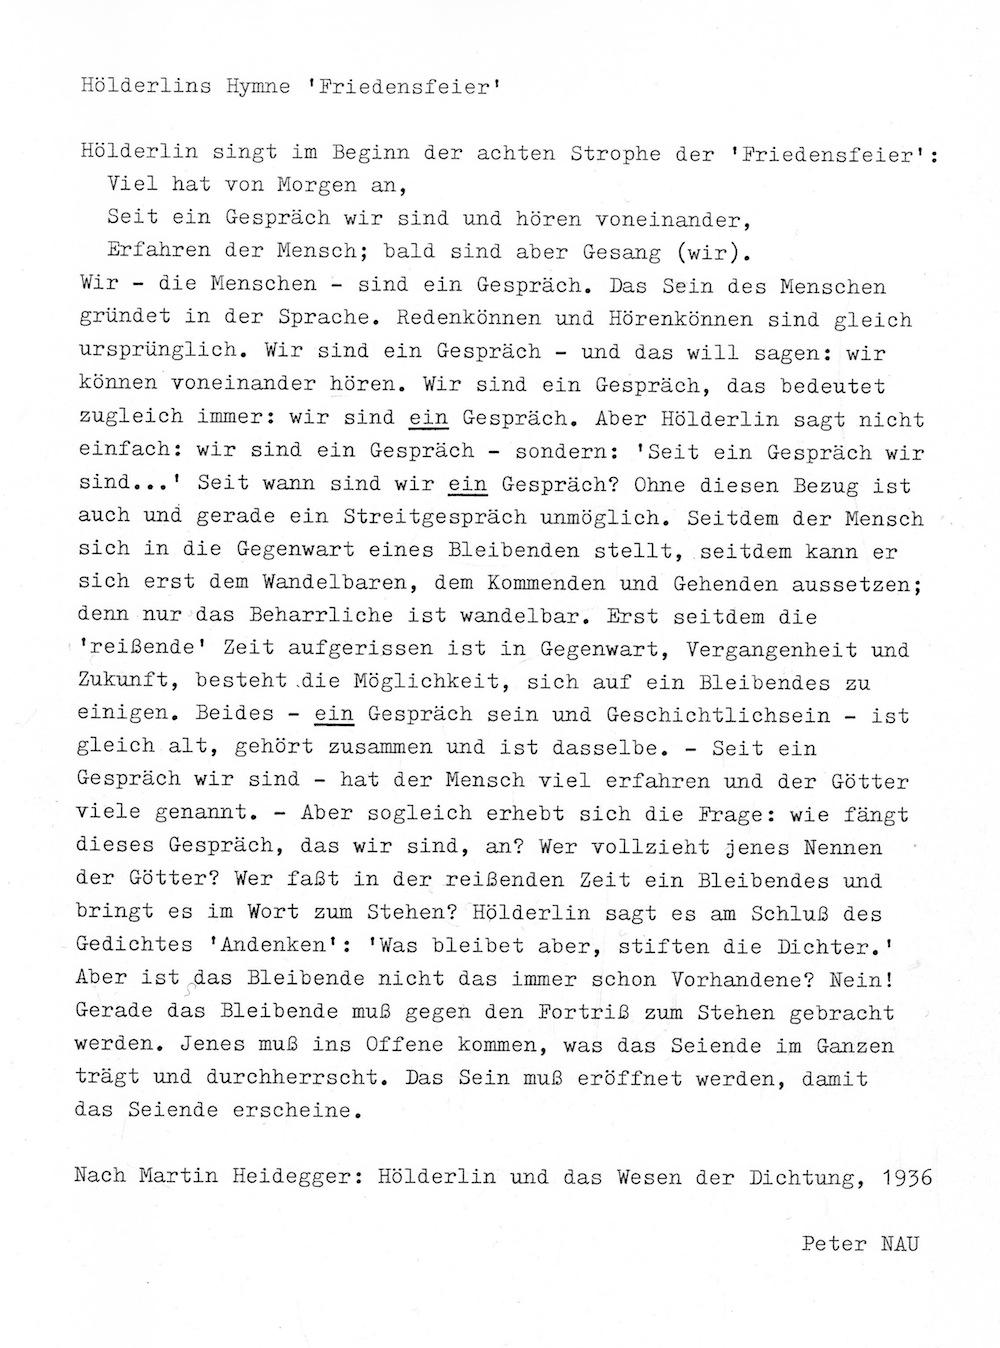 Peter NAU: Hölderlins Hymne »Friedensfeier« width=